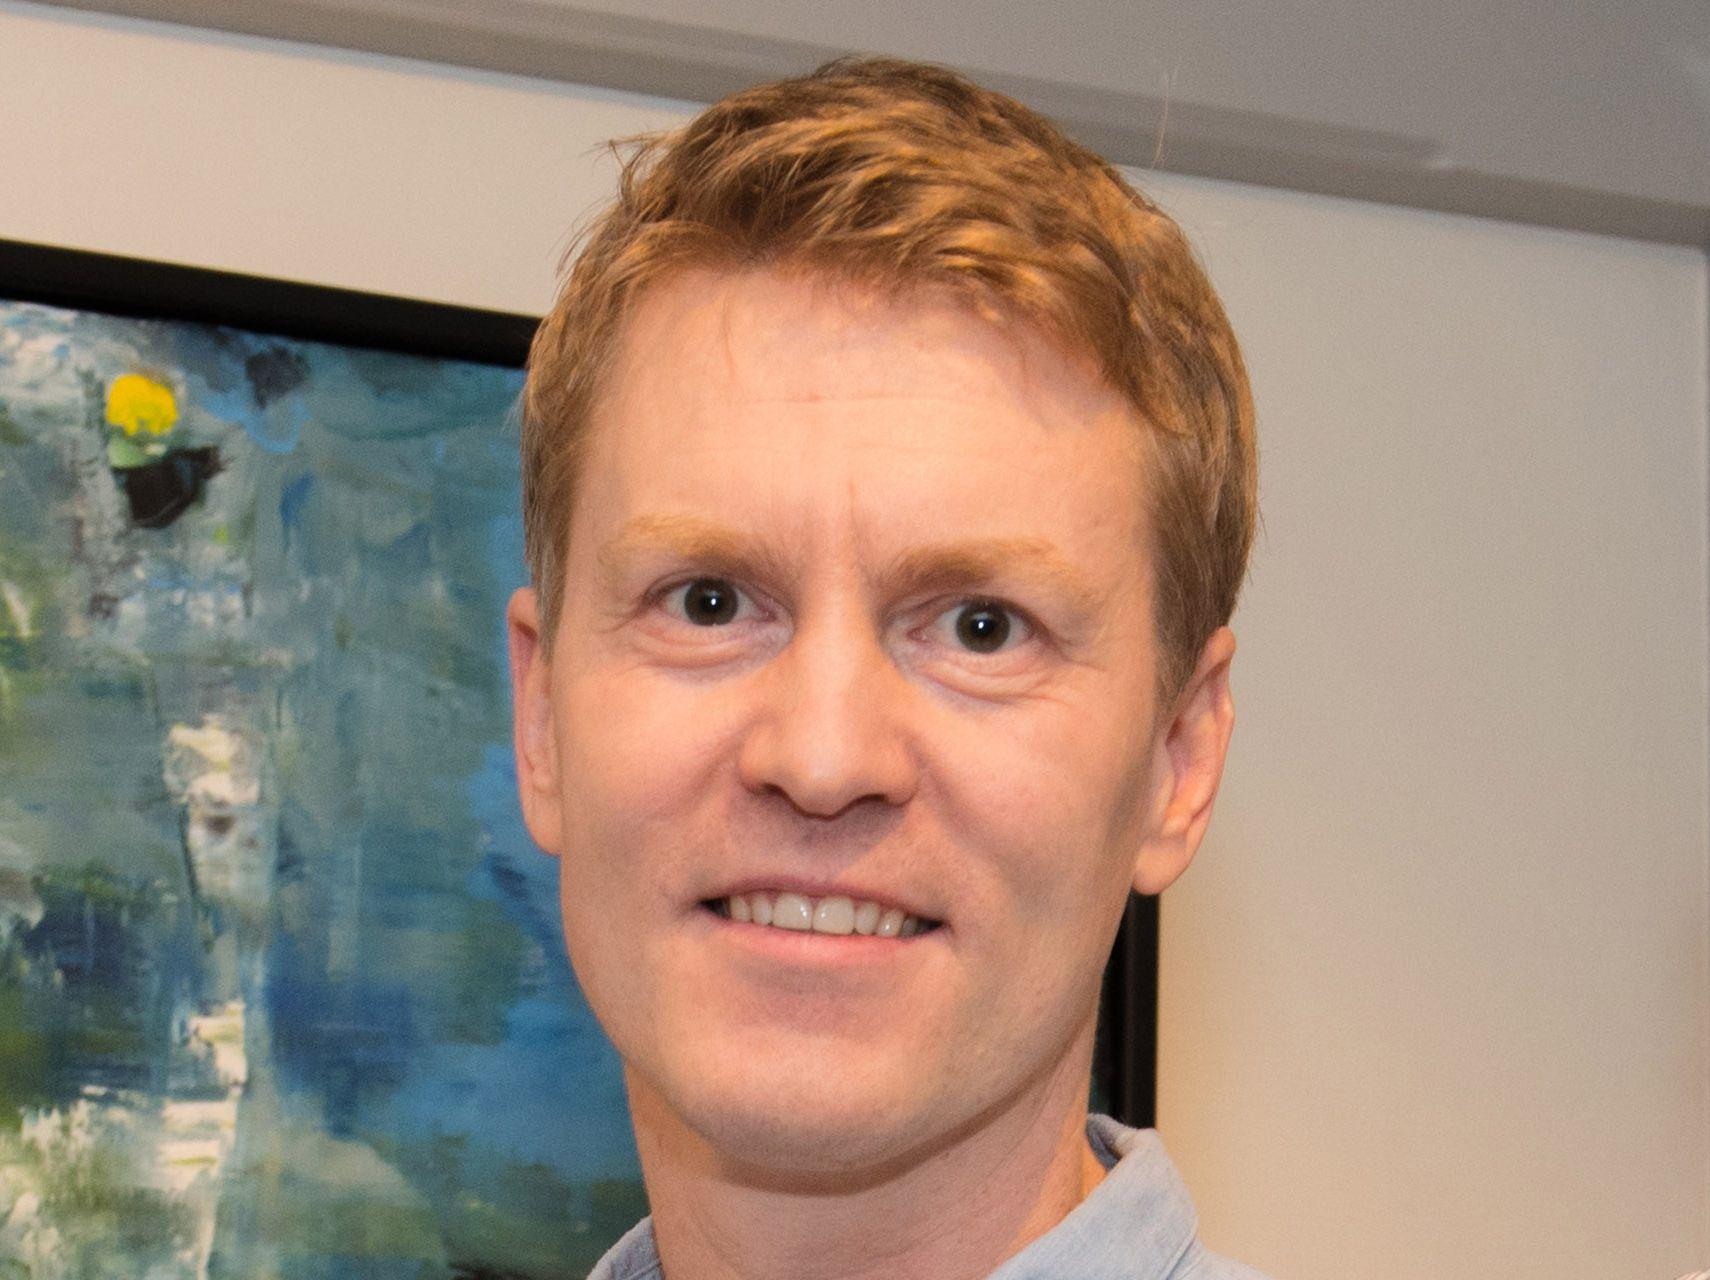 Konsernsjef Eirik Welde i Nordlaks.